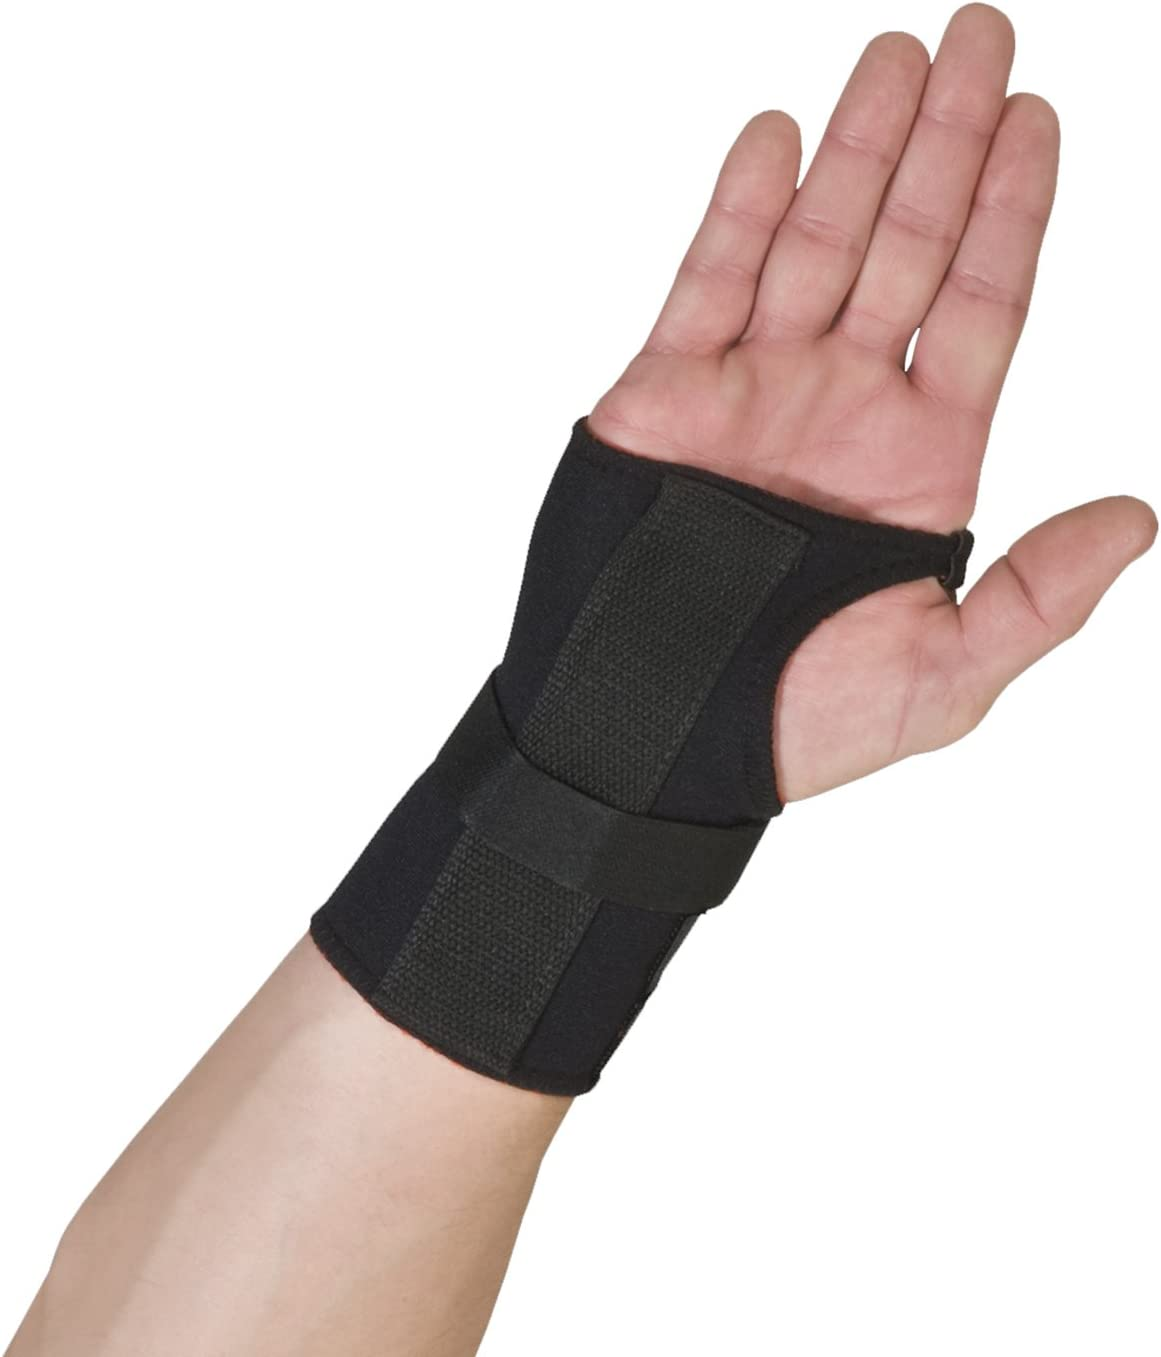 Medium Black Left Hand Thermoskin Carpal Tunnel Glove